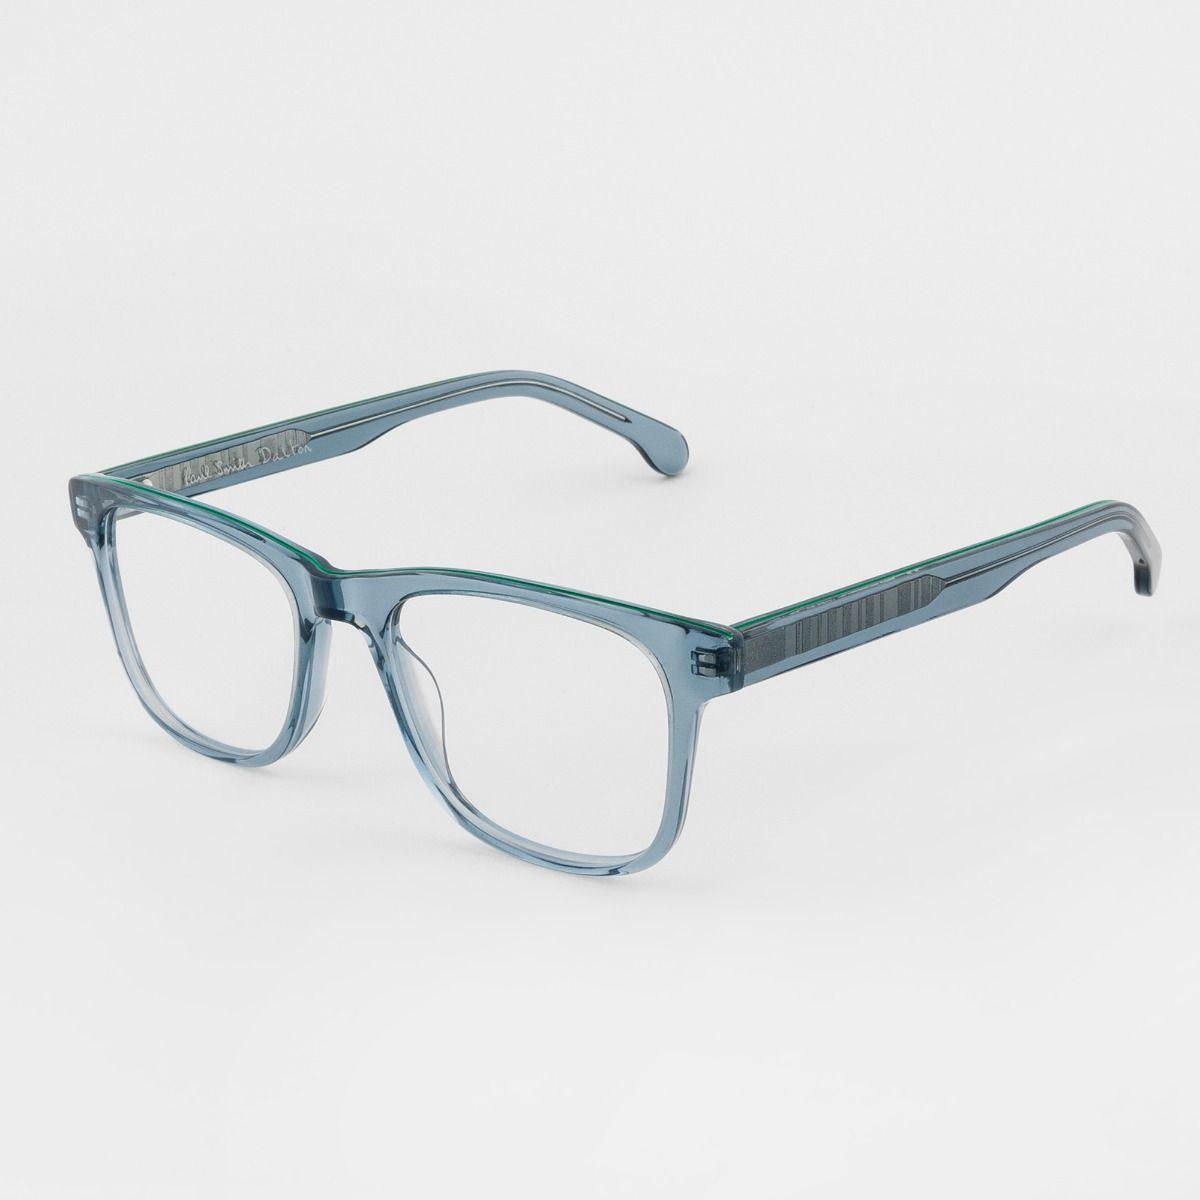 Paul Smith Dalton Optical Square Glasses